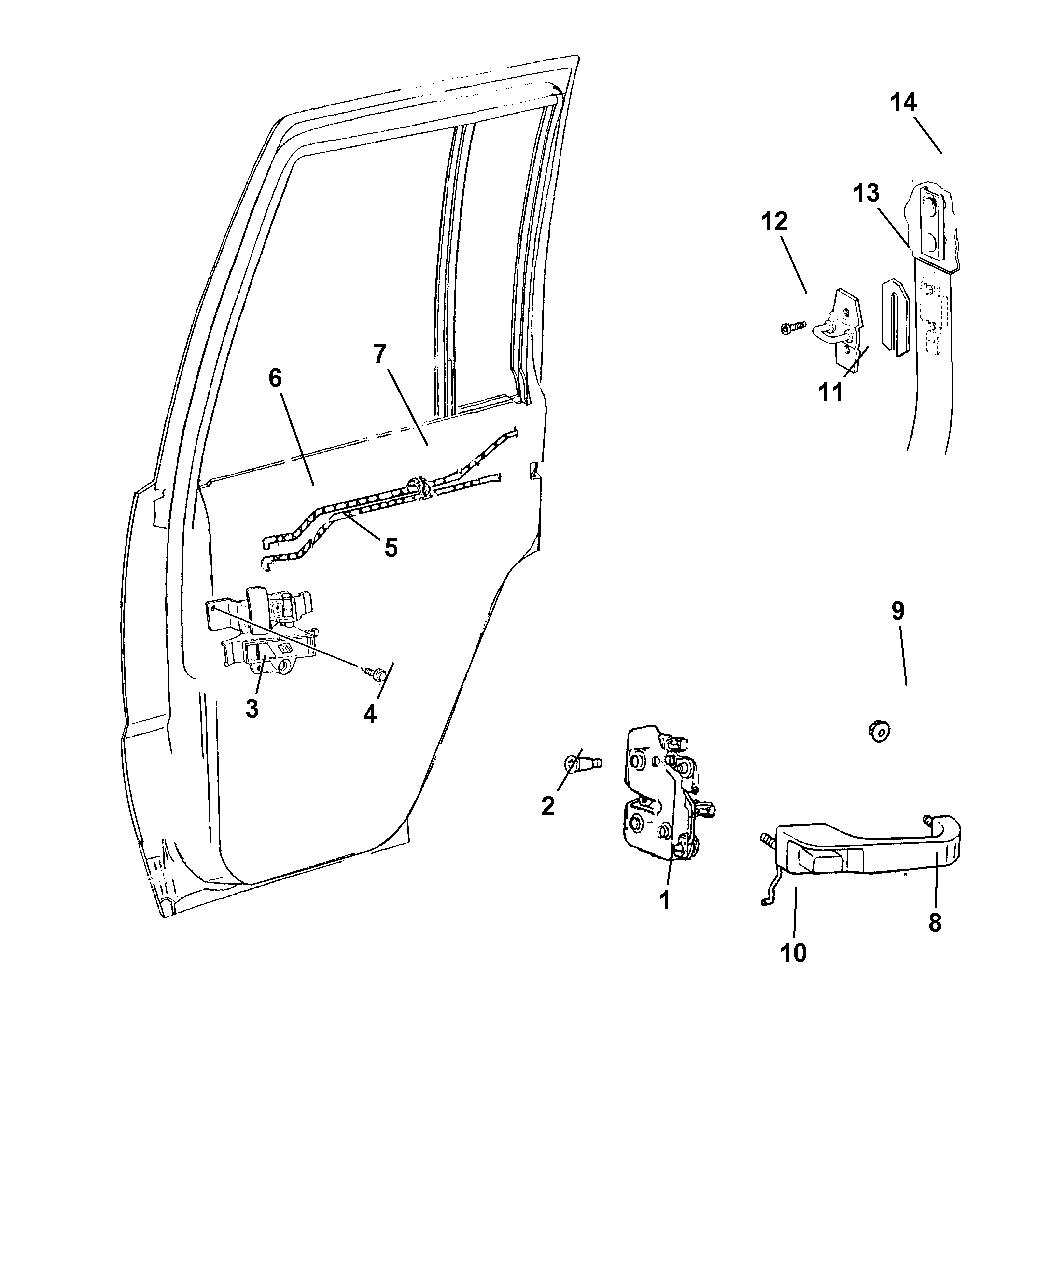 1998 Jeep Grand Cherokee Door, Rear Lock & Controls